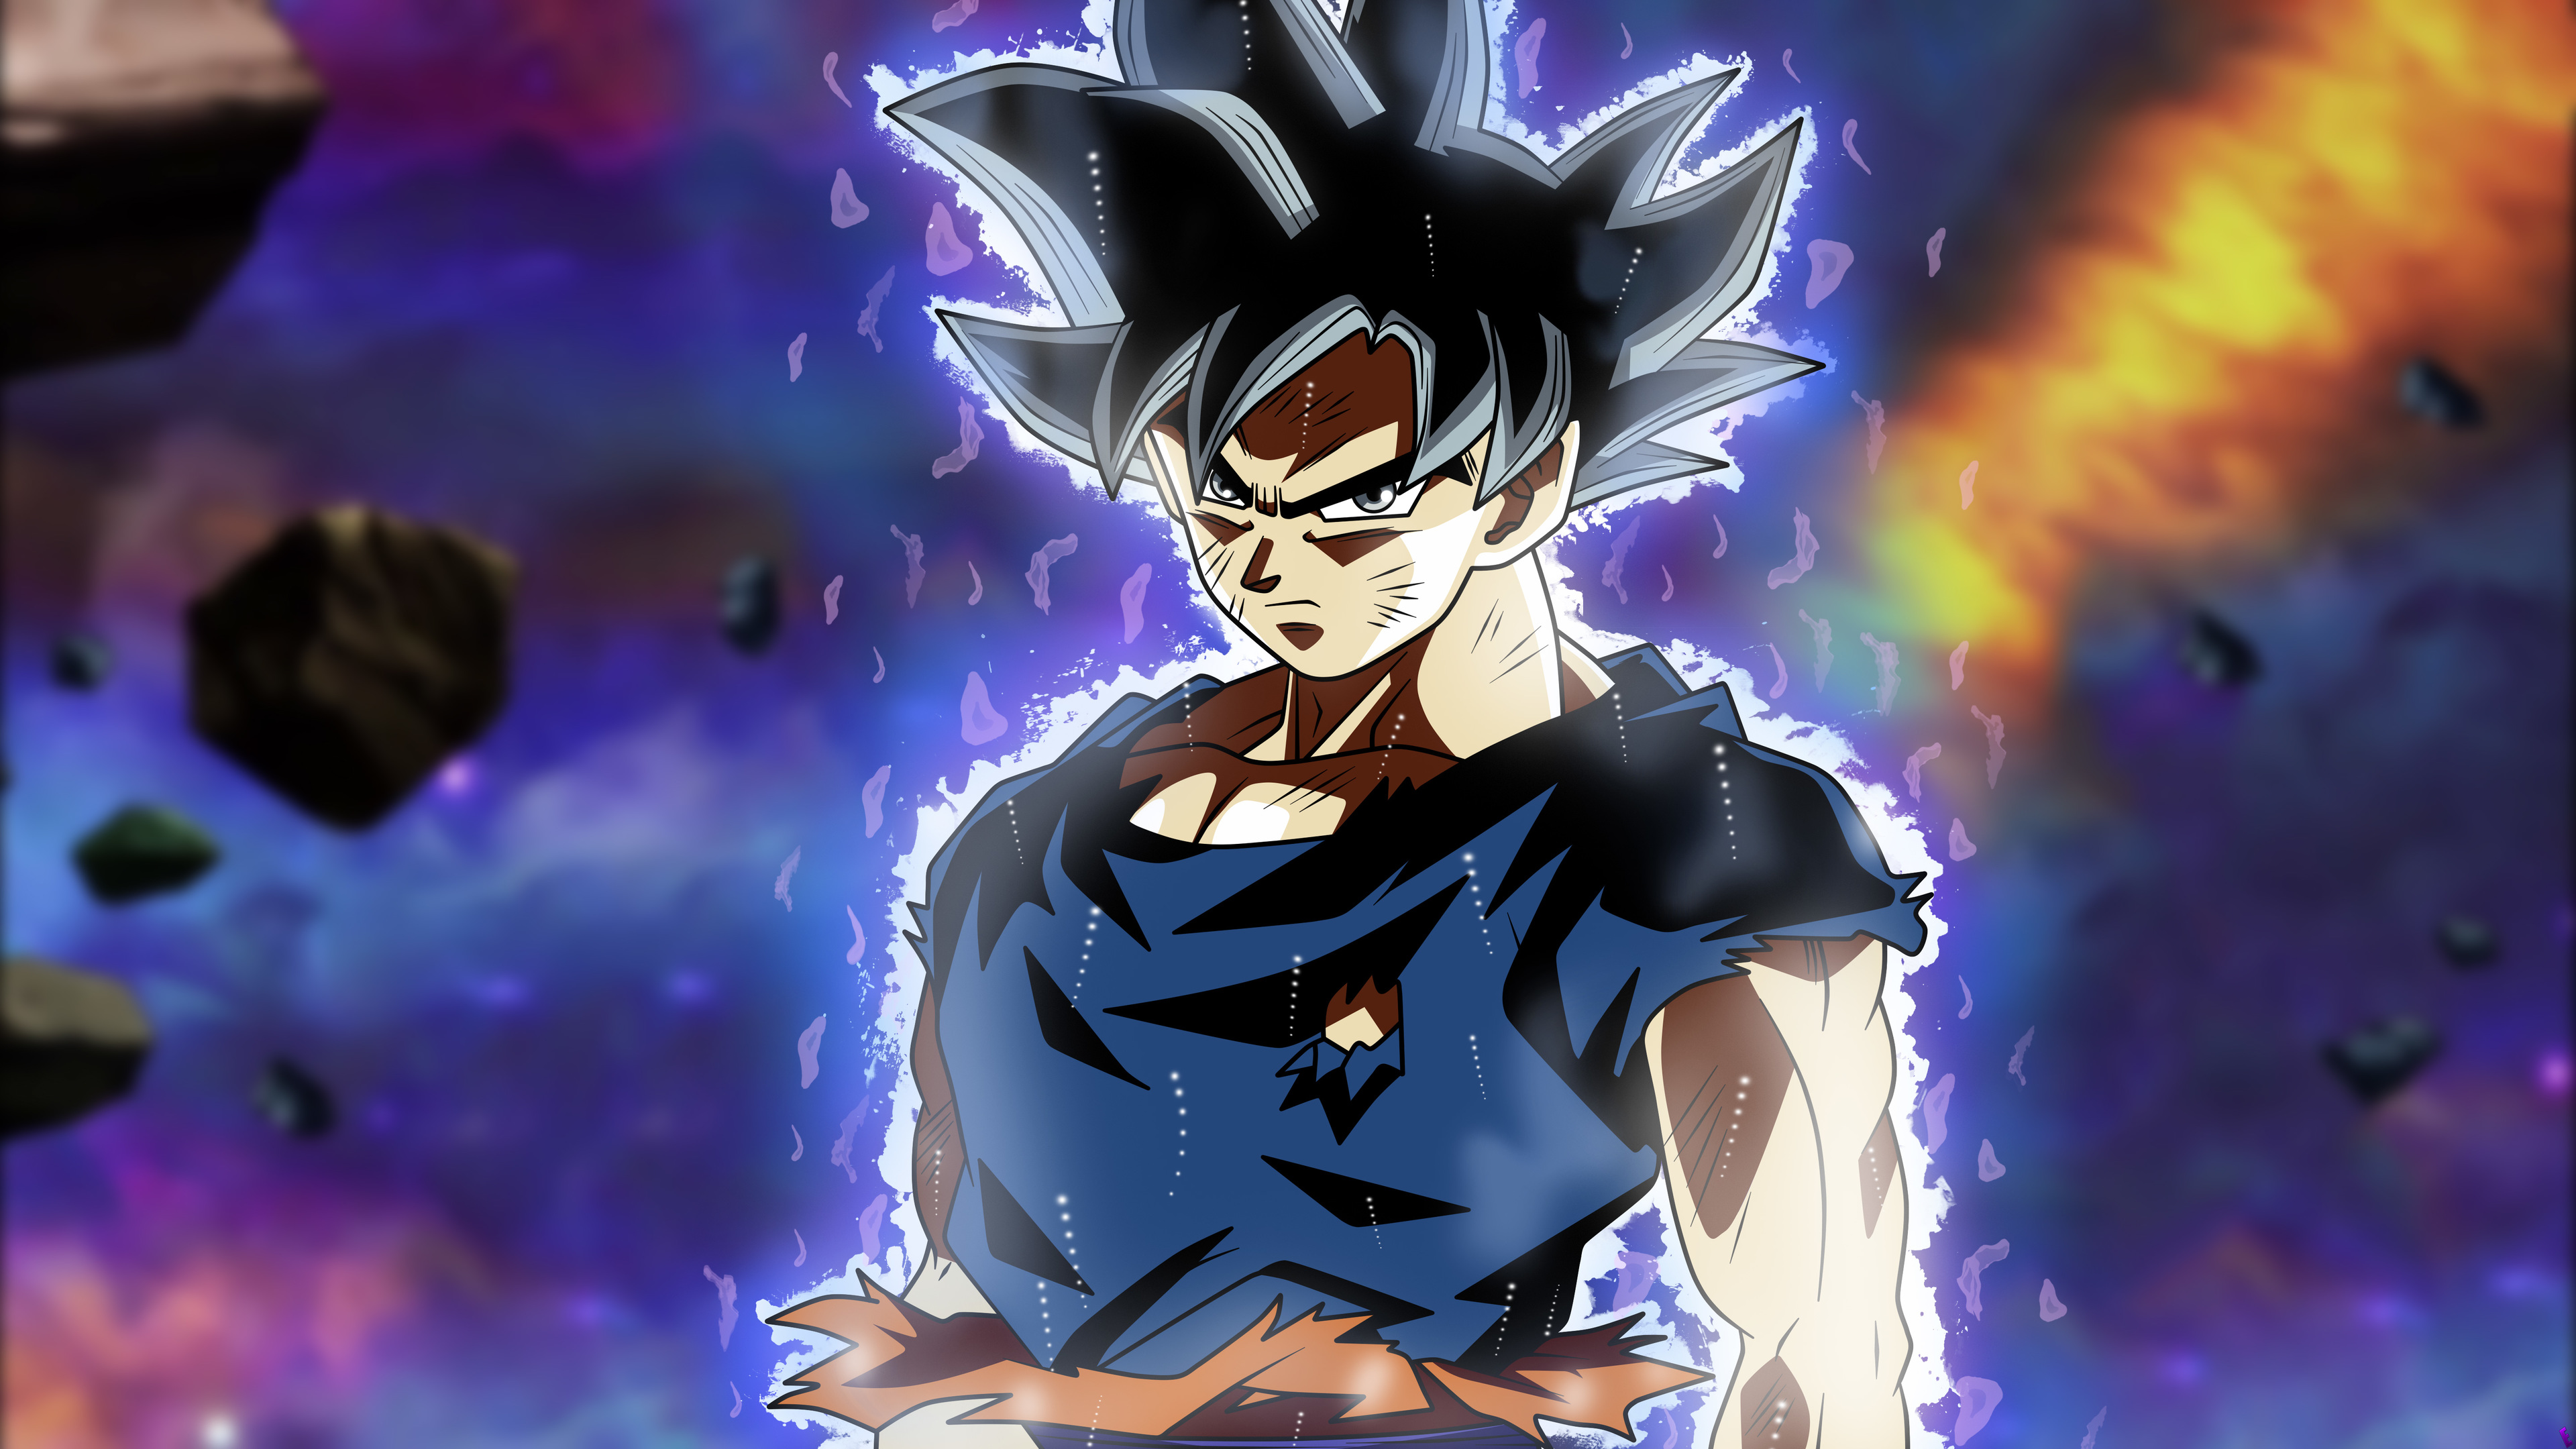 son goku dragon ball super 4k anime 1541974217 - Son Goku Dragon Ball Super 4k Anime - hd-wallpapers, goku wallpapers, dragon ball wallpapers, dragon ball super wallpapers, artist wallpapers, anime wallpapers, 4k-wallpapers